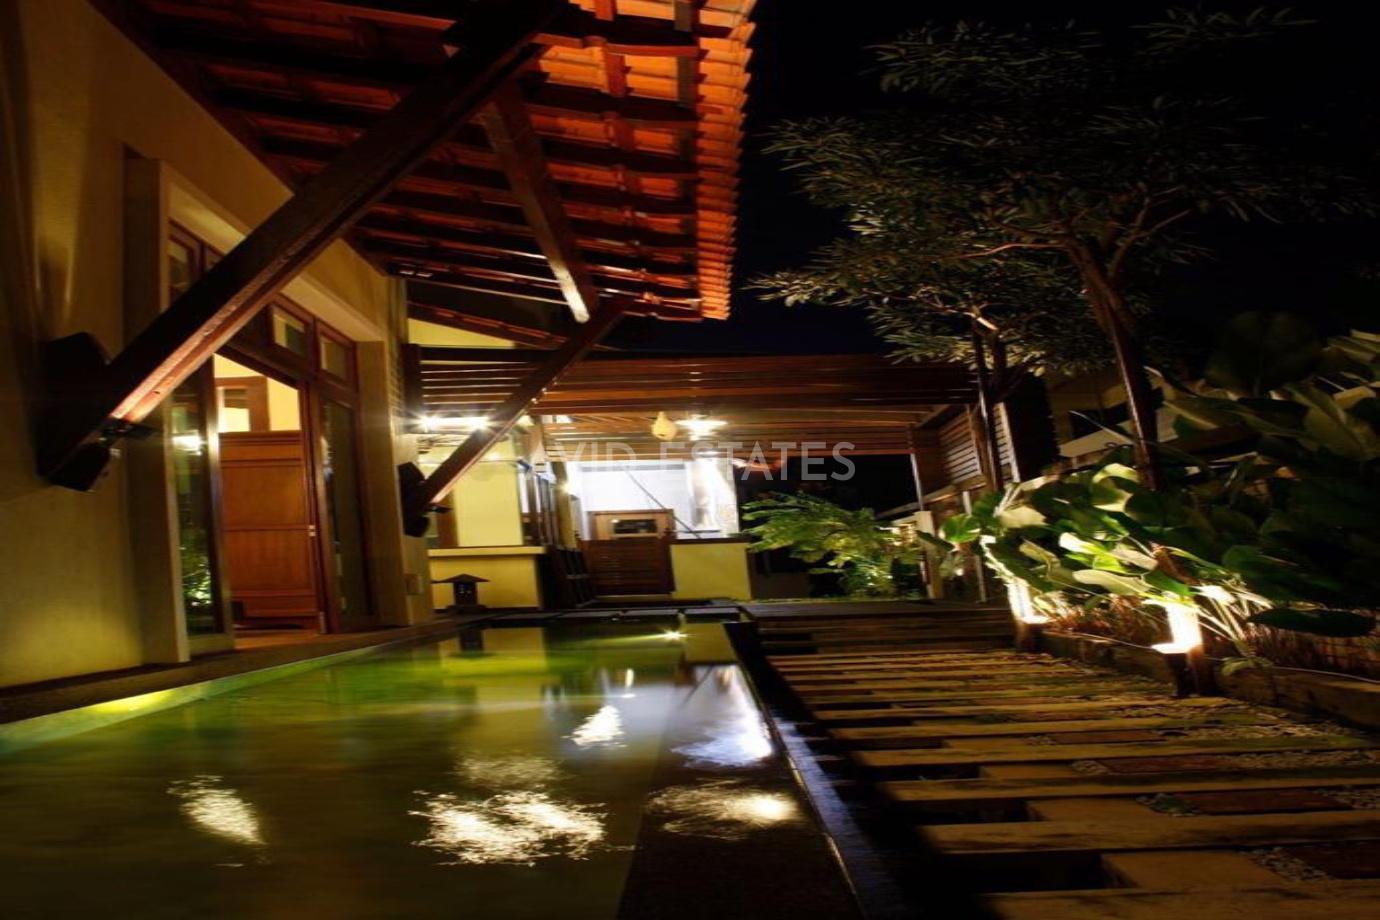 Bukit Damansara,Kuala Lumpur, 8 Bedrooms Bedrooms, ,6 BathroomsBathrooms,Bungalow / Detached,For Sale,Bukit Damansara,2168